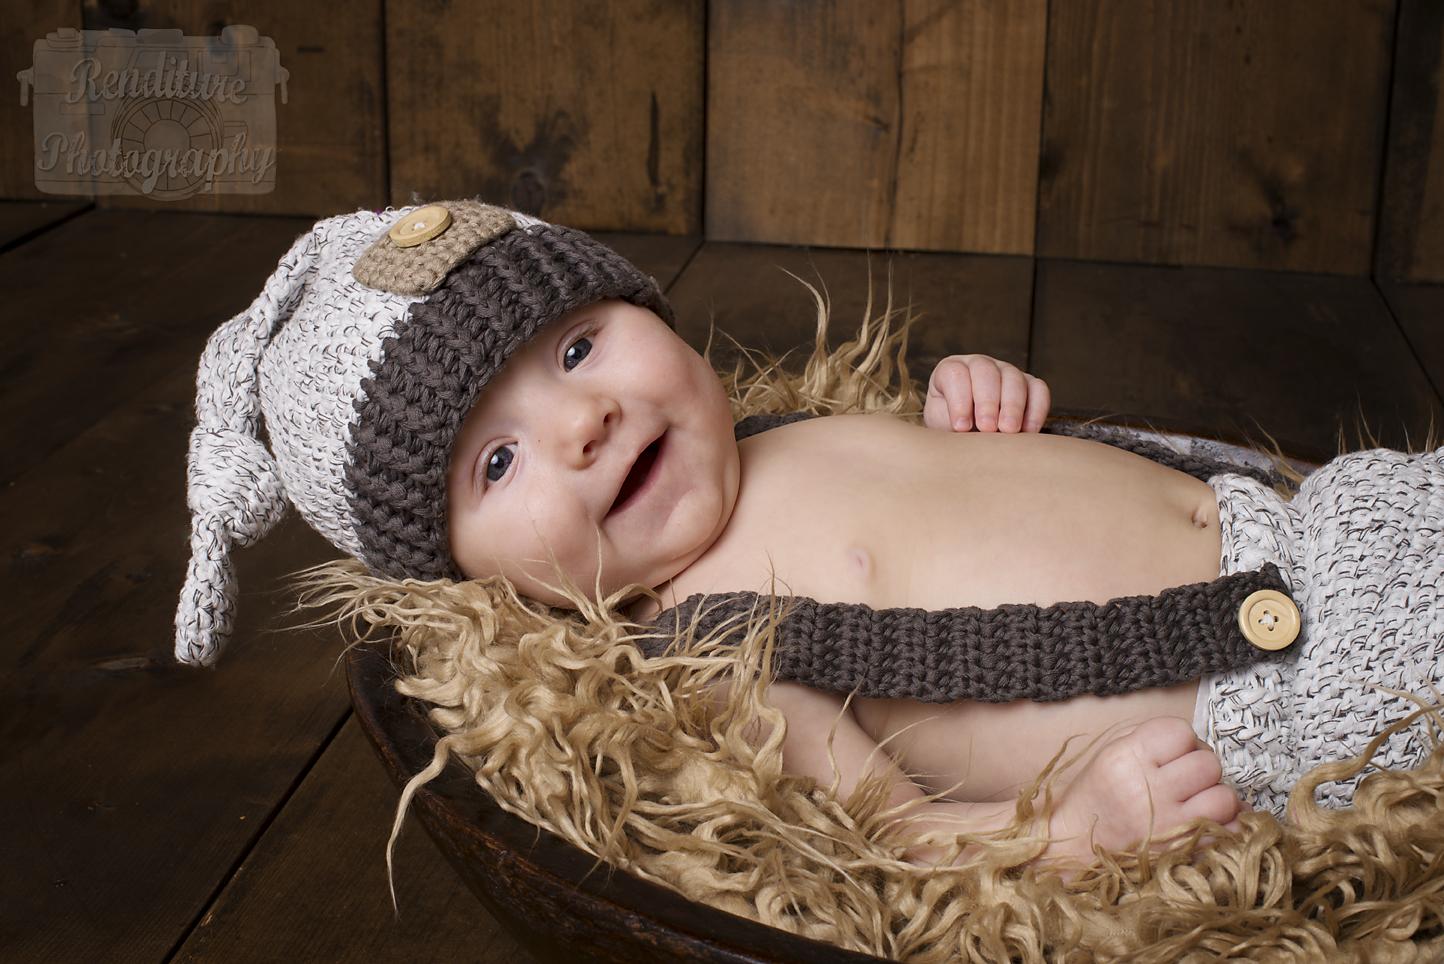 Saskatoon-Newborn-Family-Renditure-Baby-Photography-Photographer-Maternity-Pregnancy-Saskatchewan-159mFBR.png